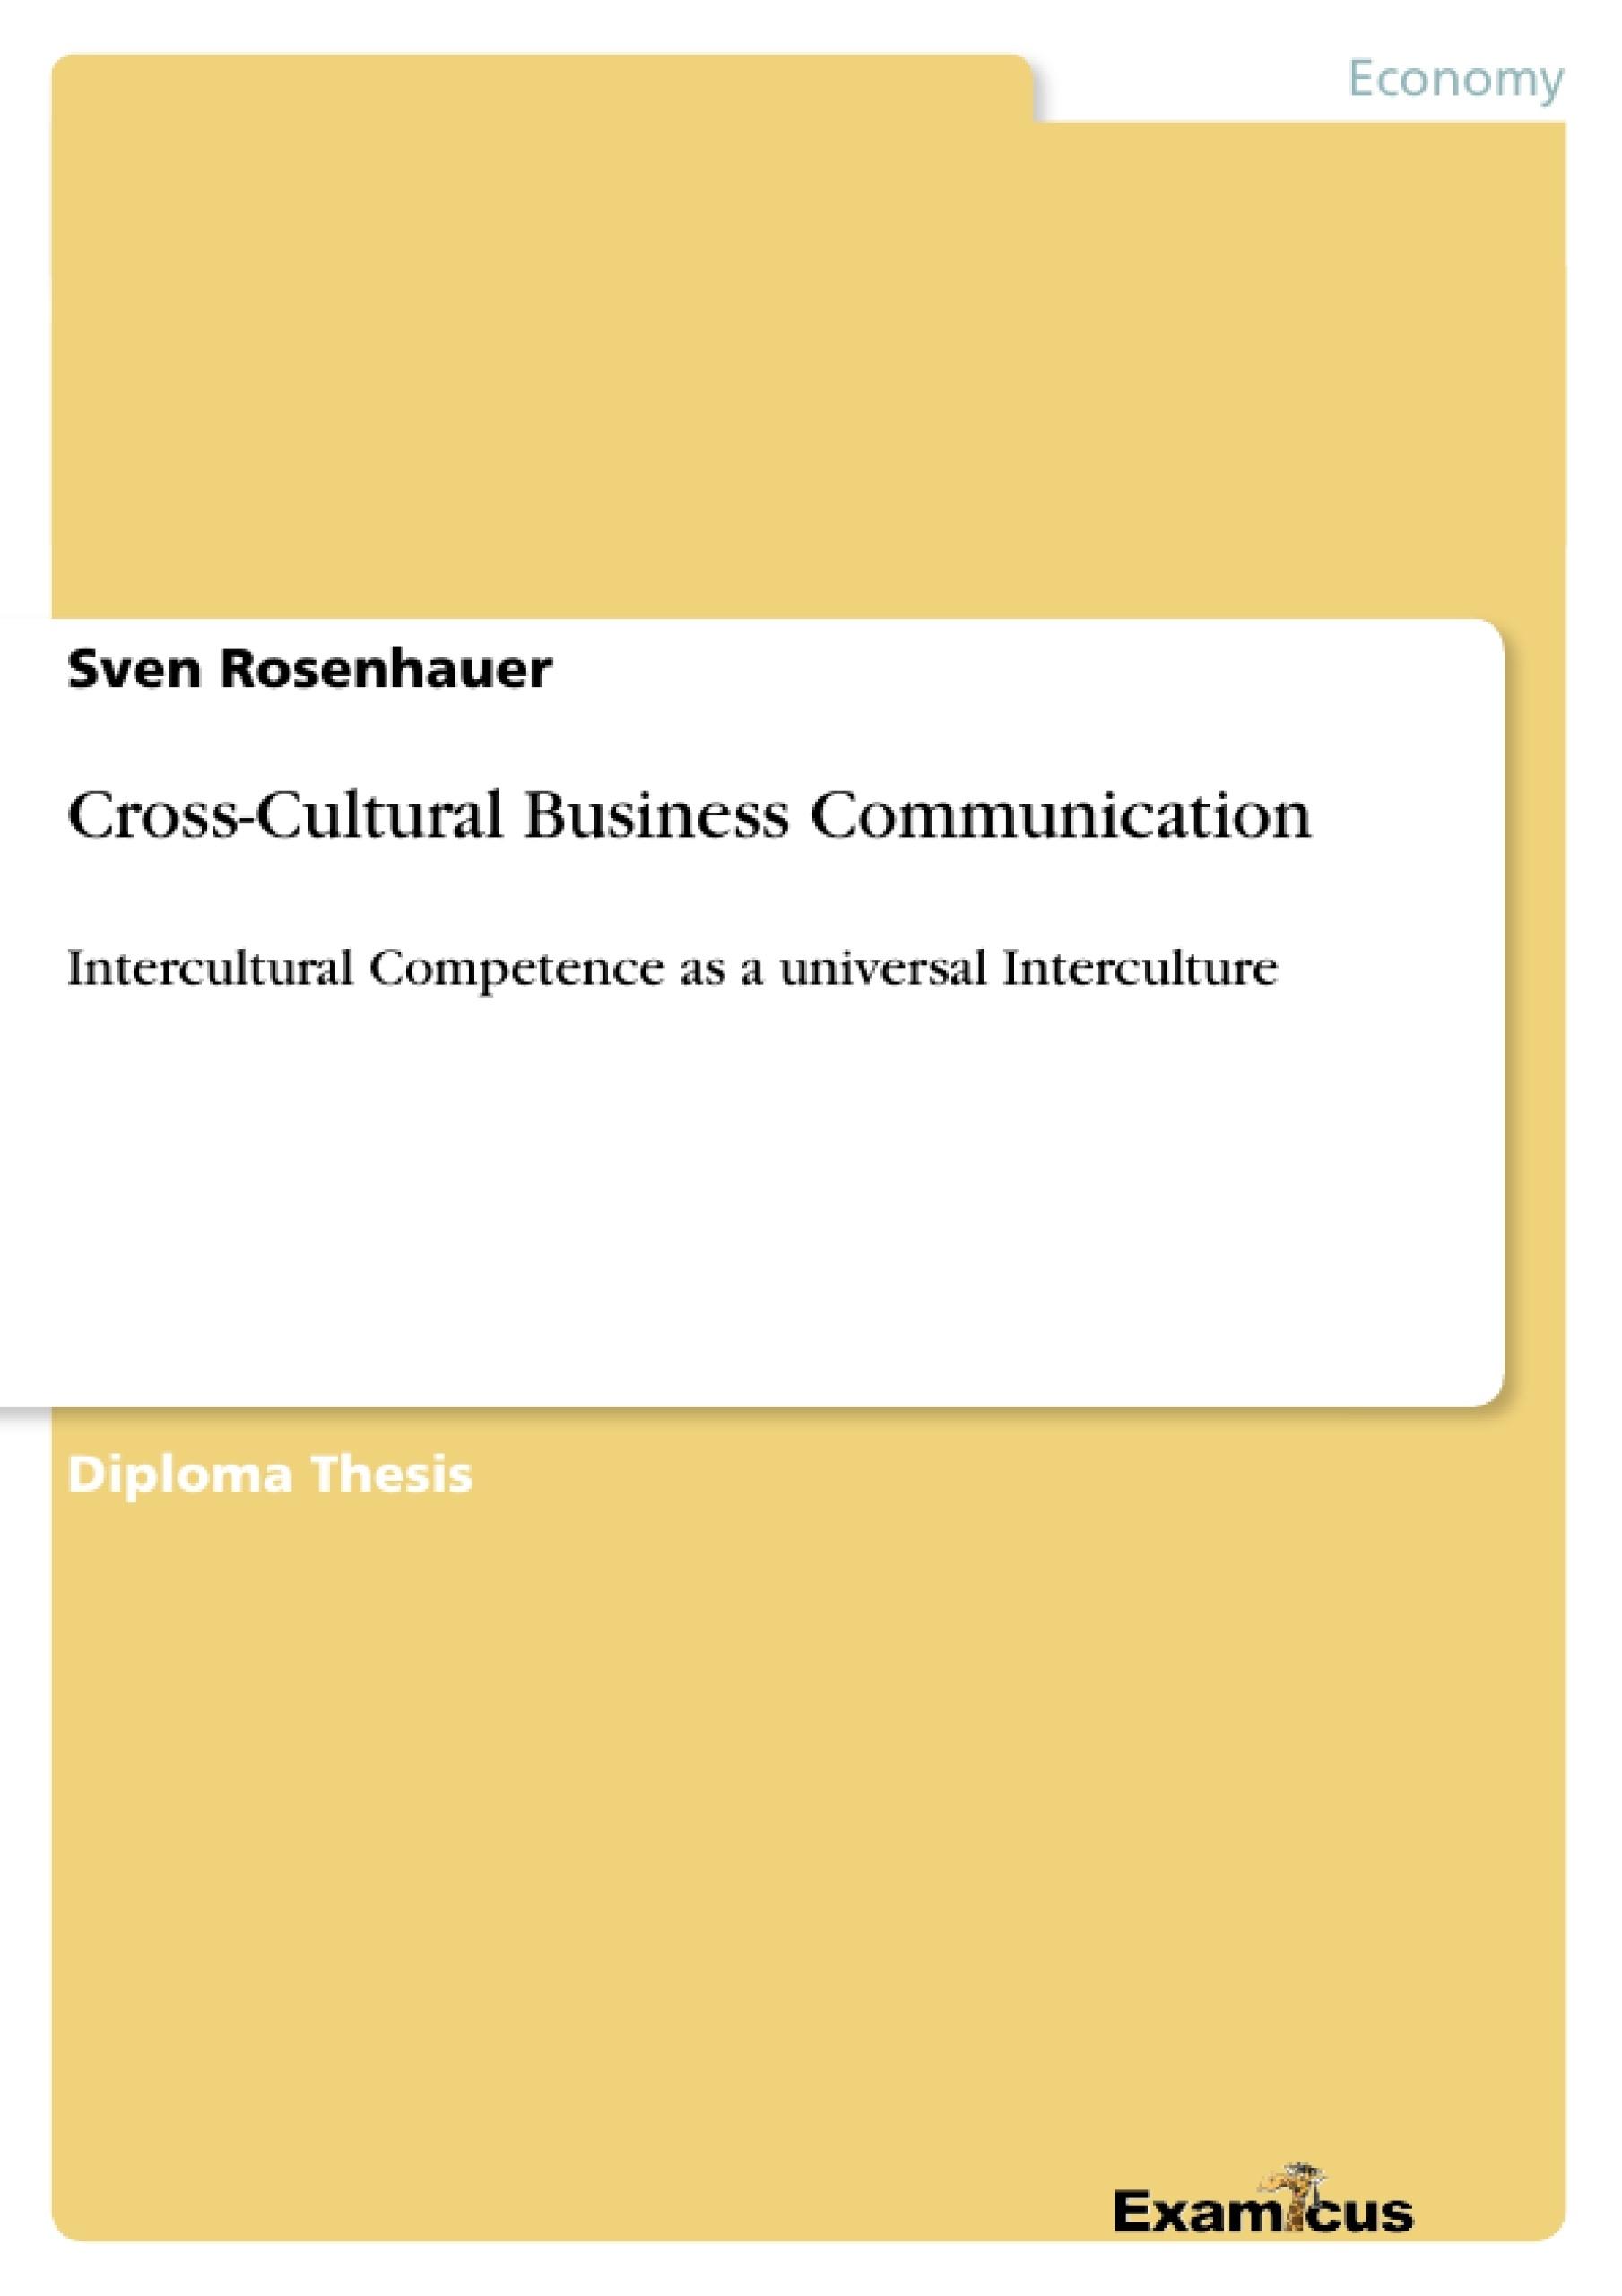 Title: Cross-Cultural Business Communication